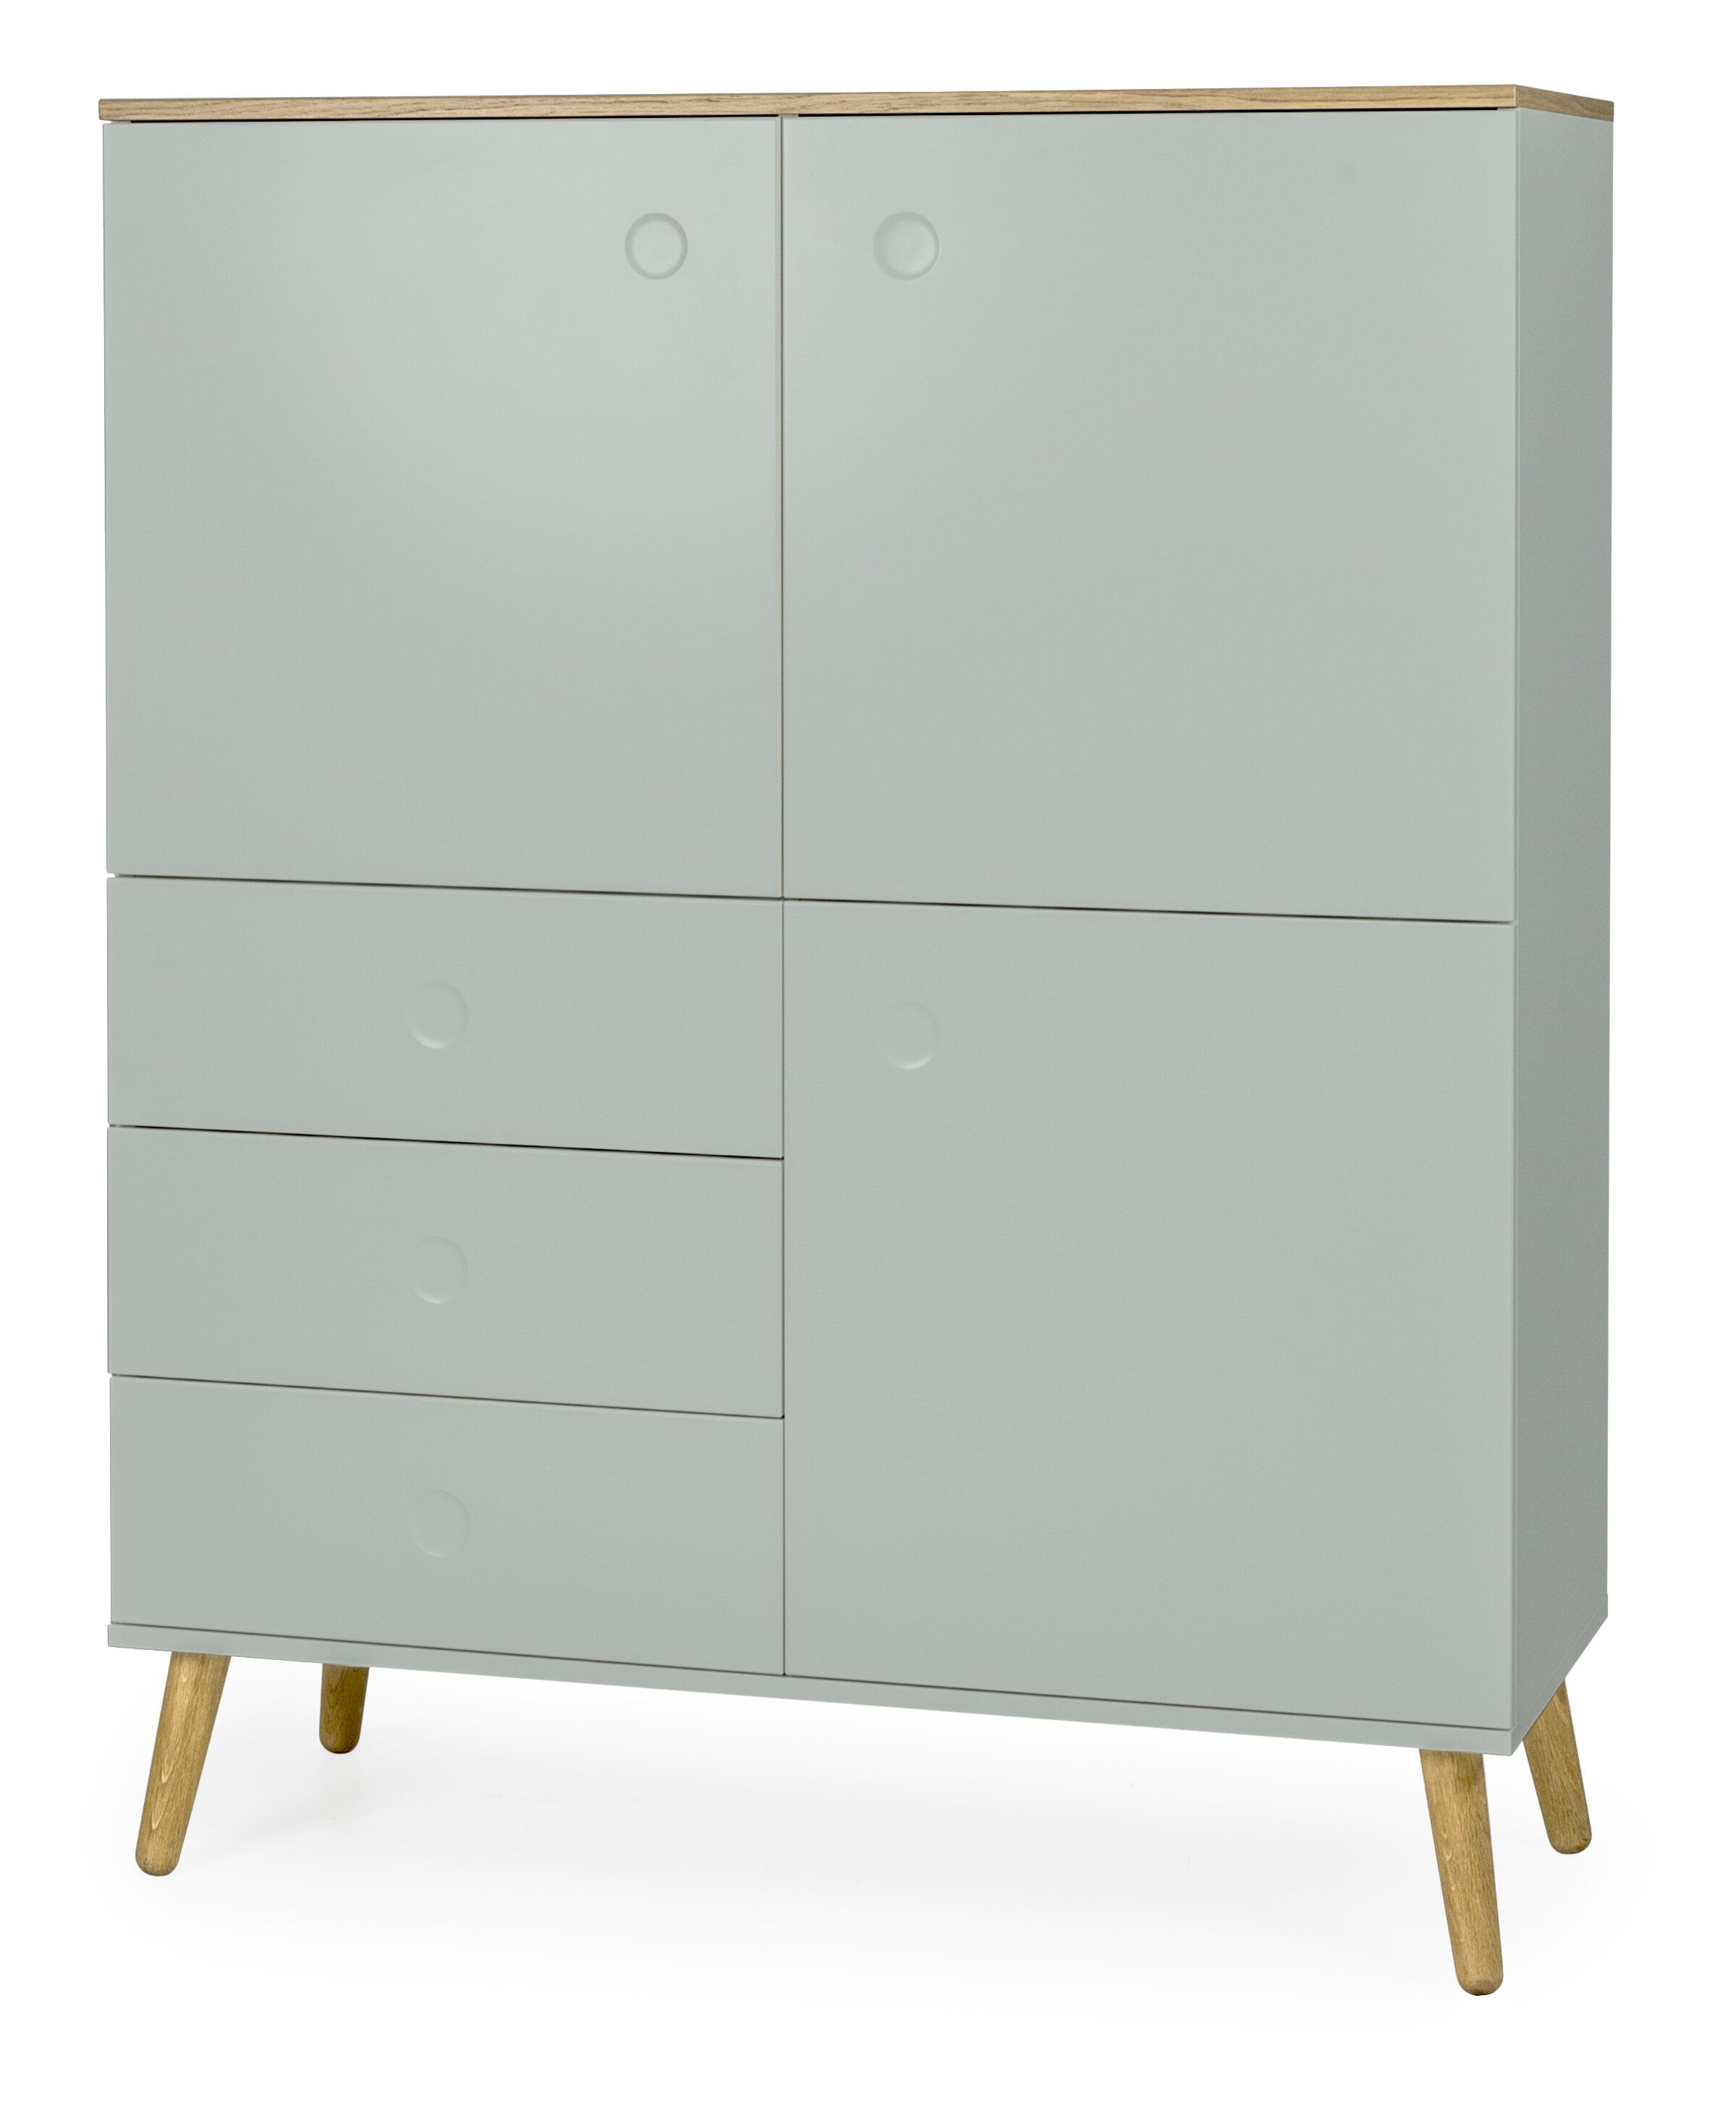 Tenzo Opbergkast 'Dot' 137 x 109cm, kleur Groen/Eiken